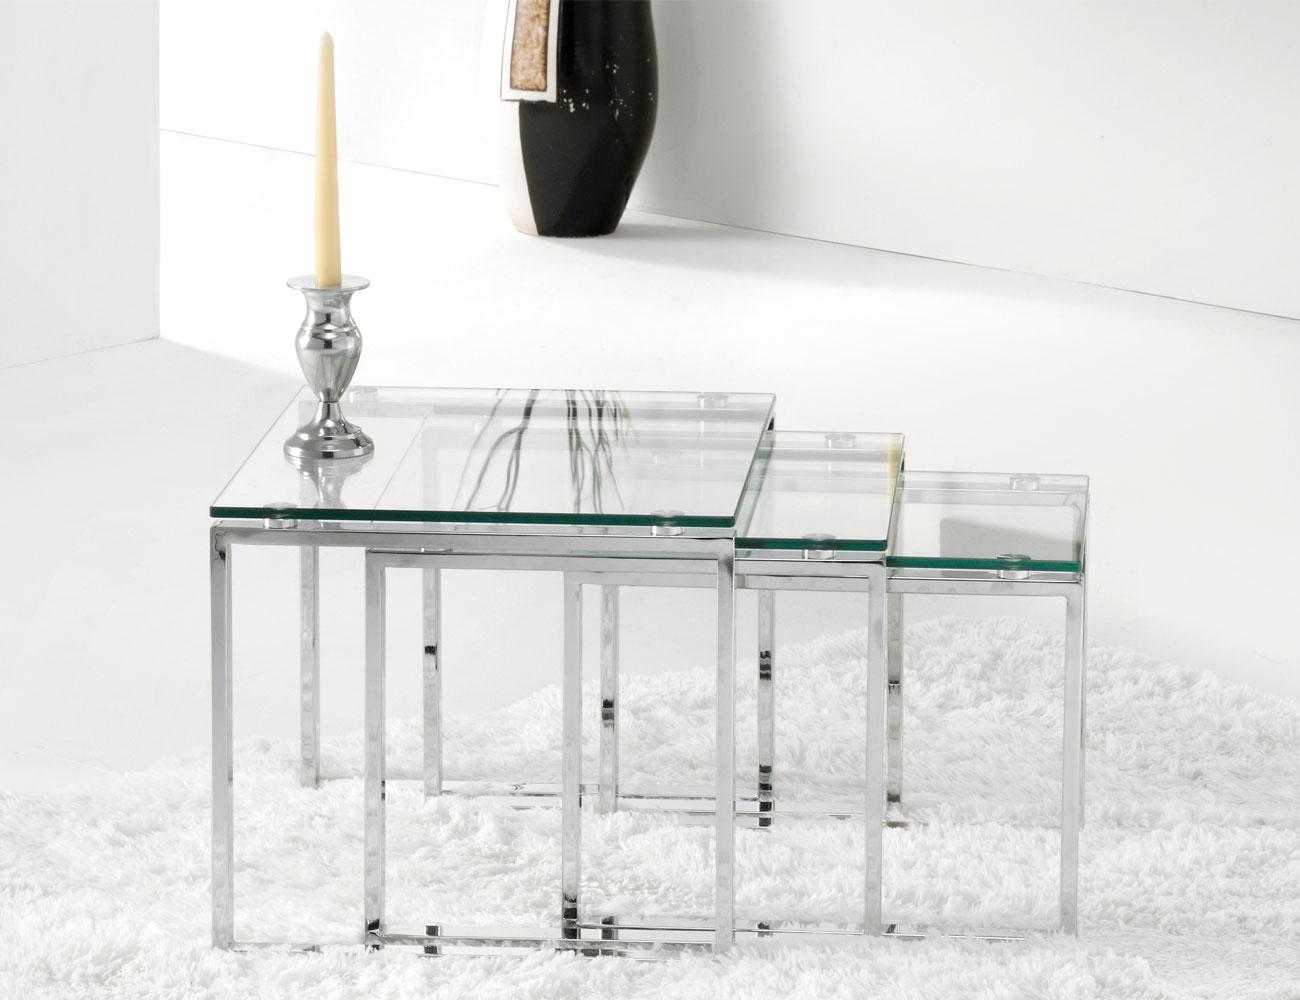 Mesa rincon cristal templado cromado